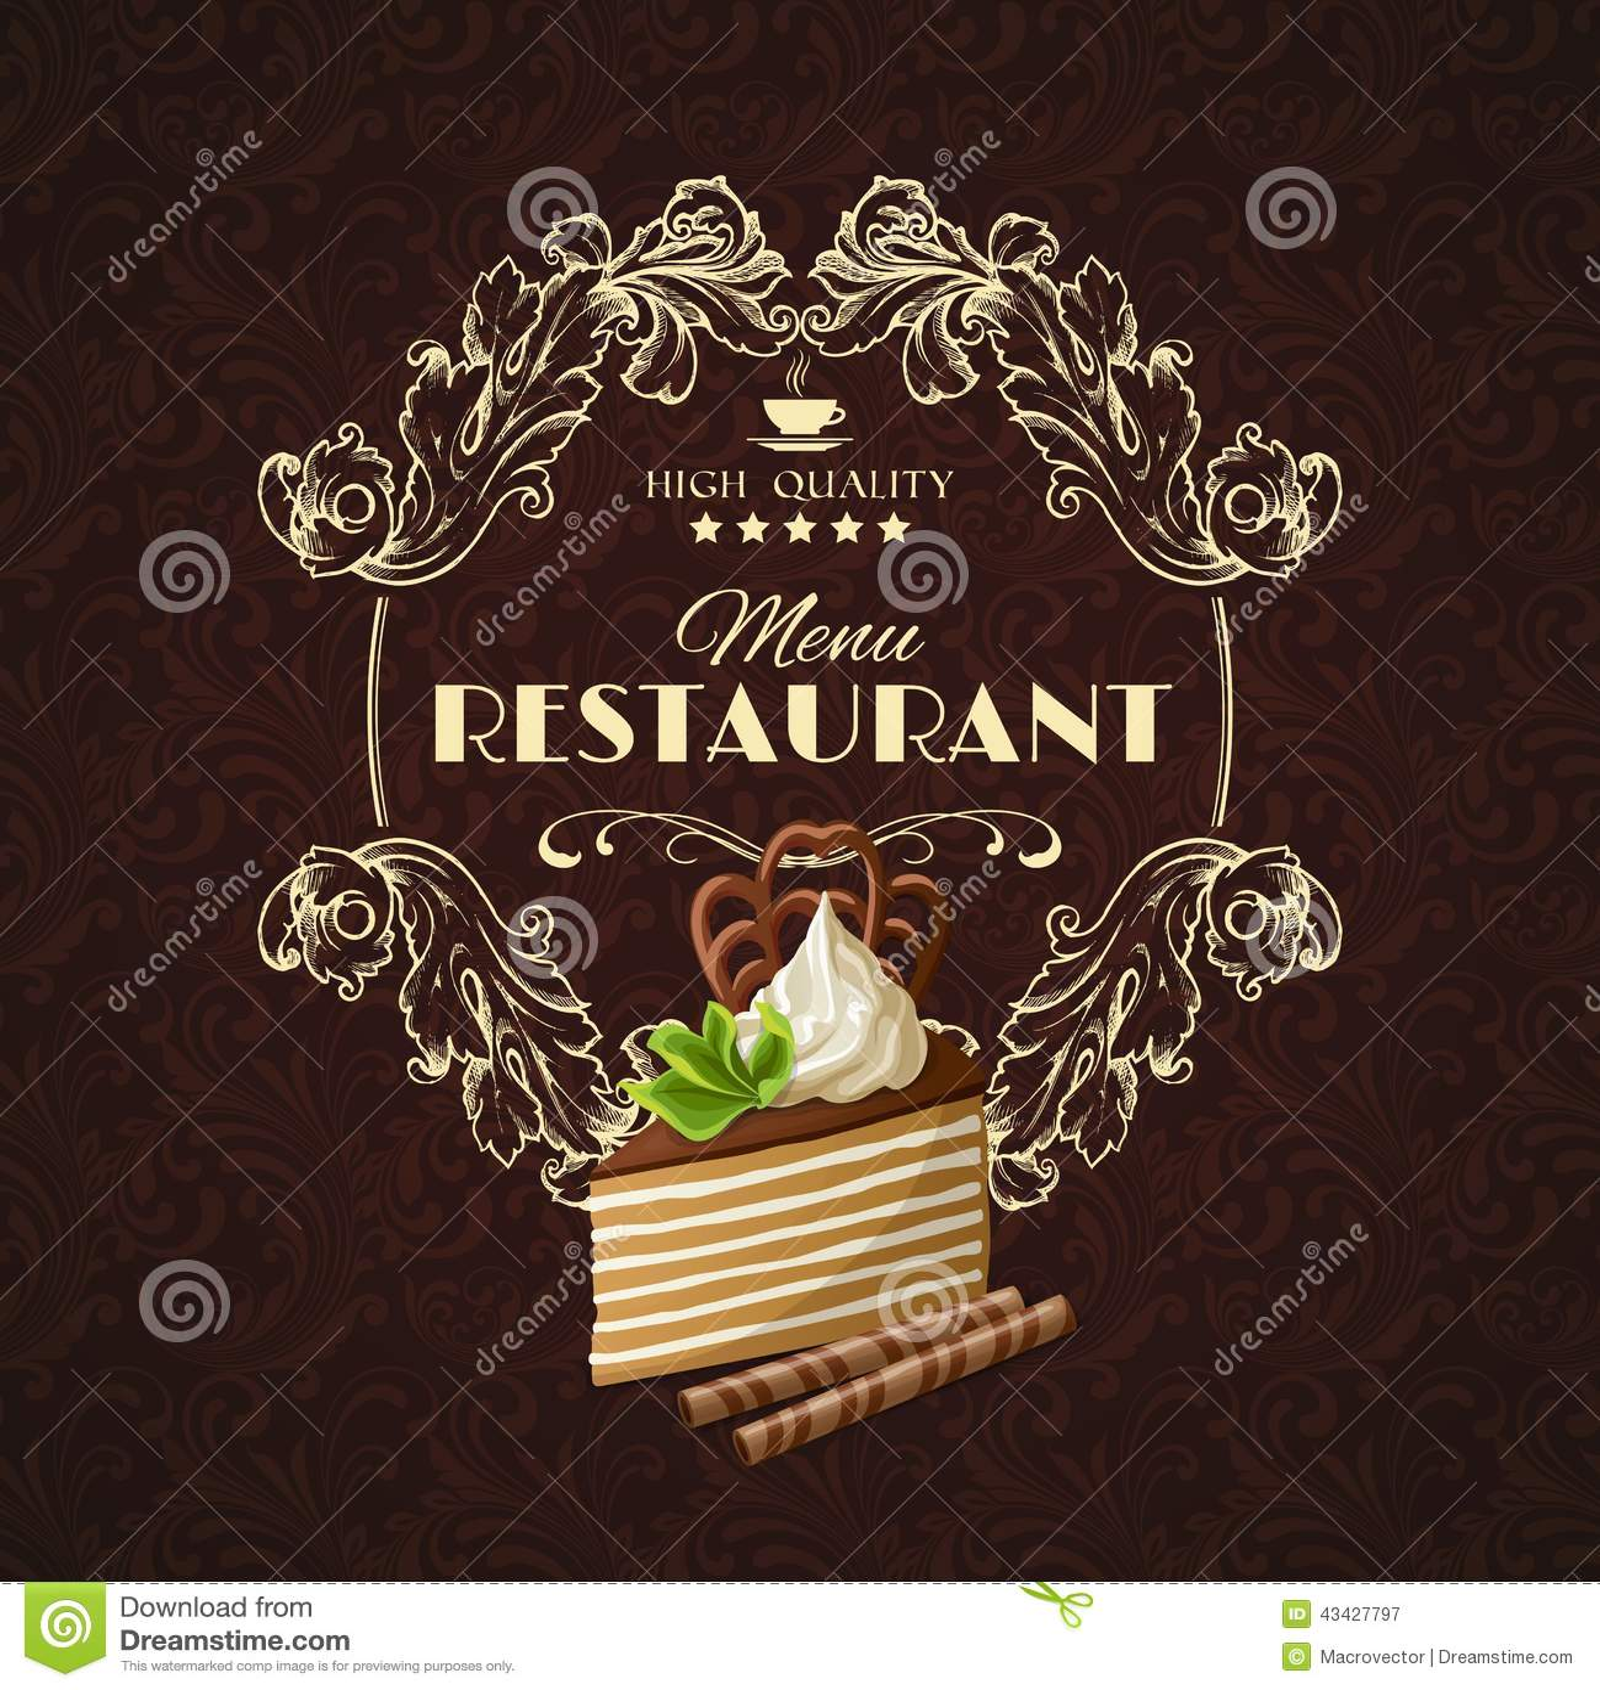 The Chocolate Dessert Cafe Menu